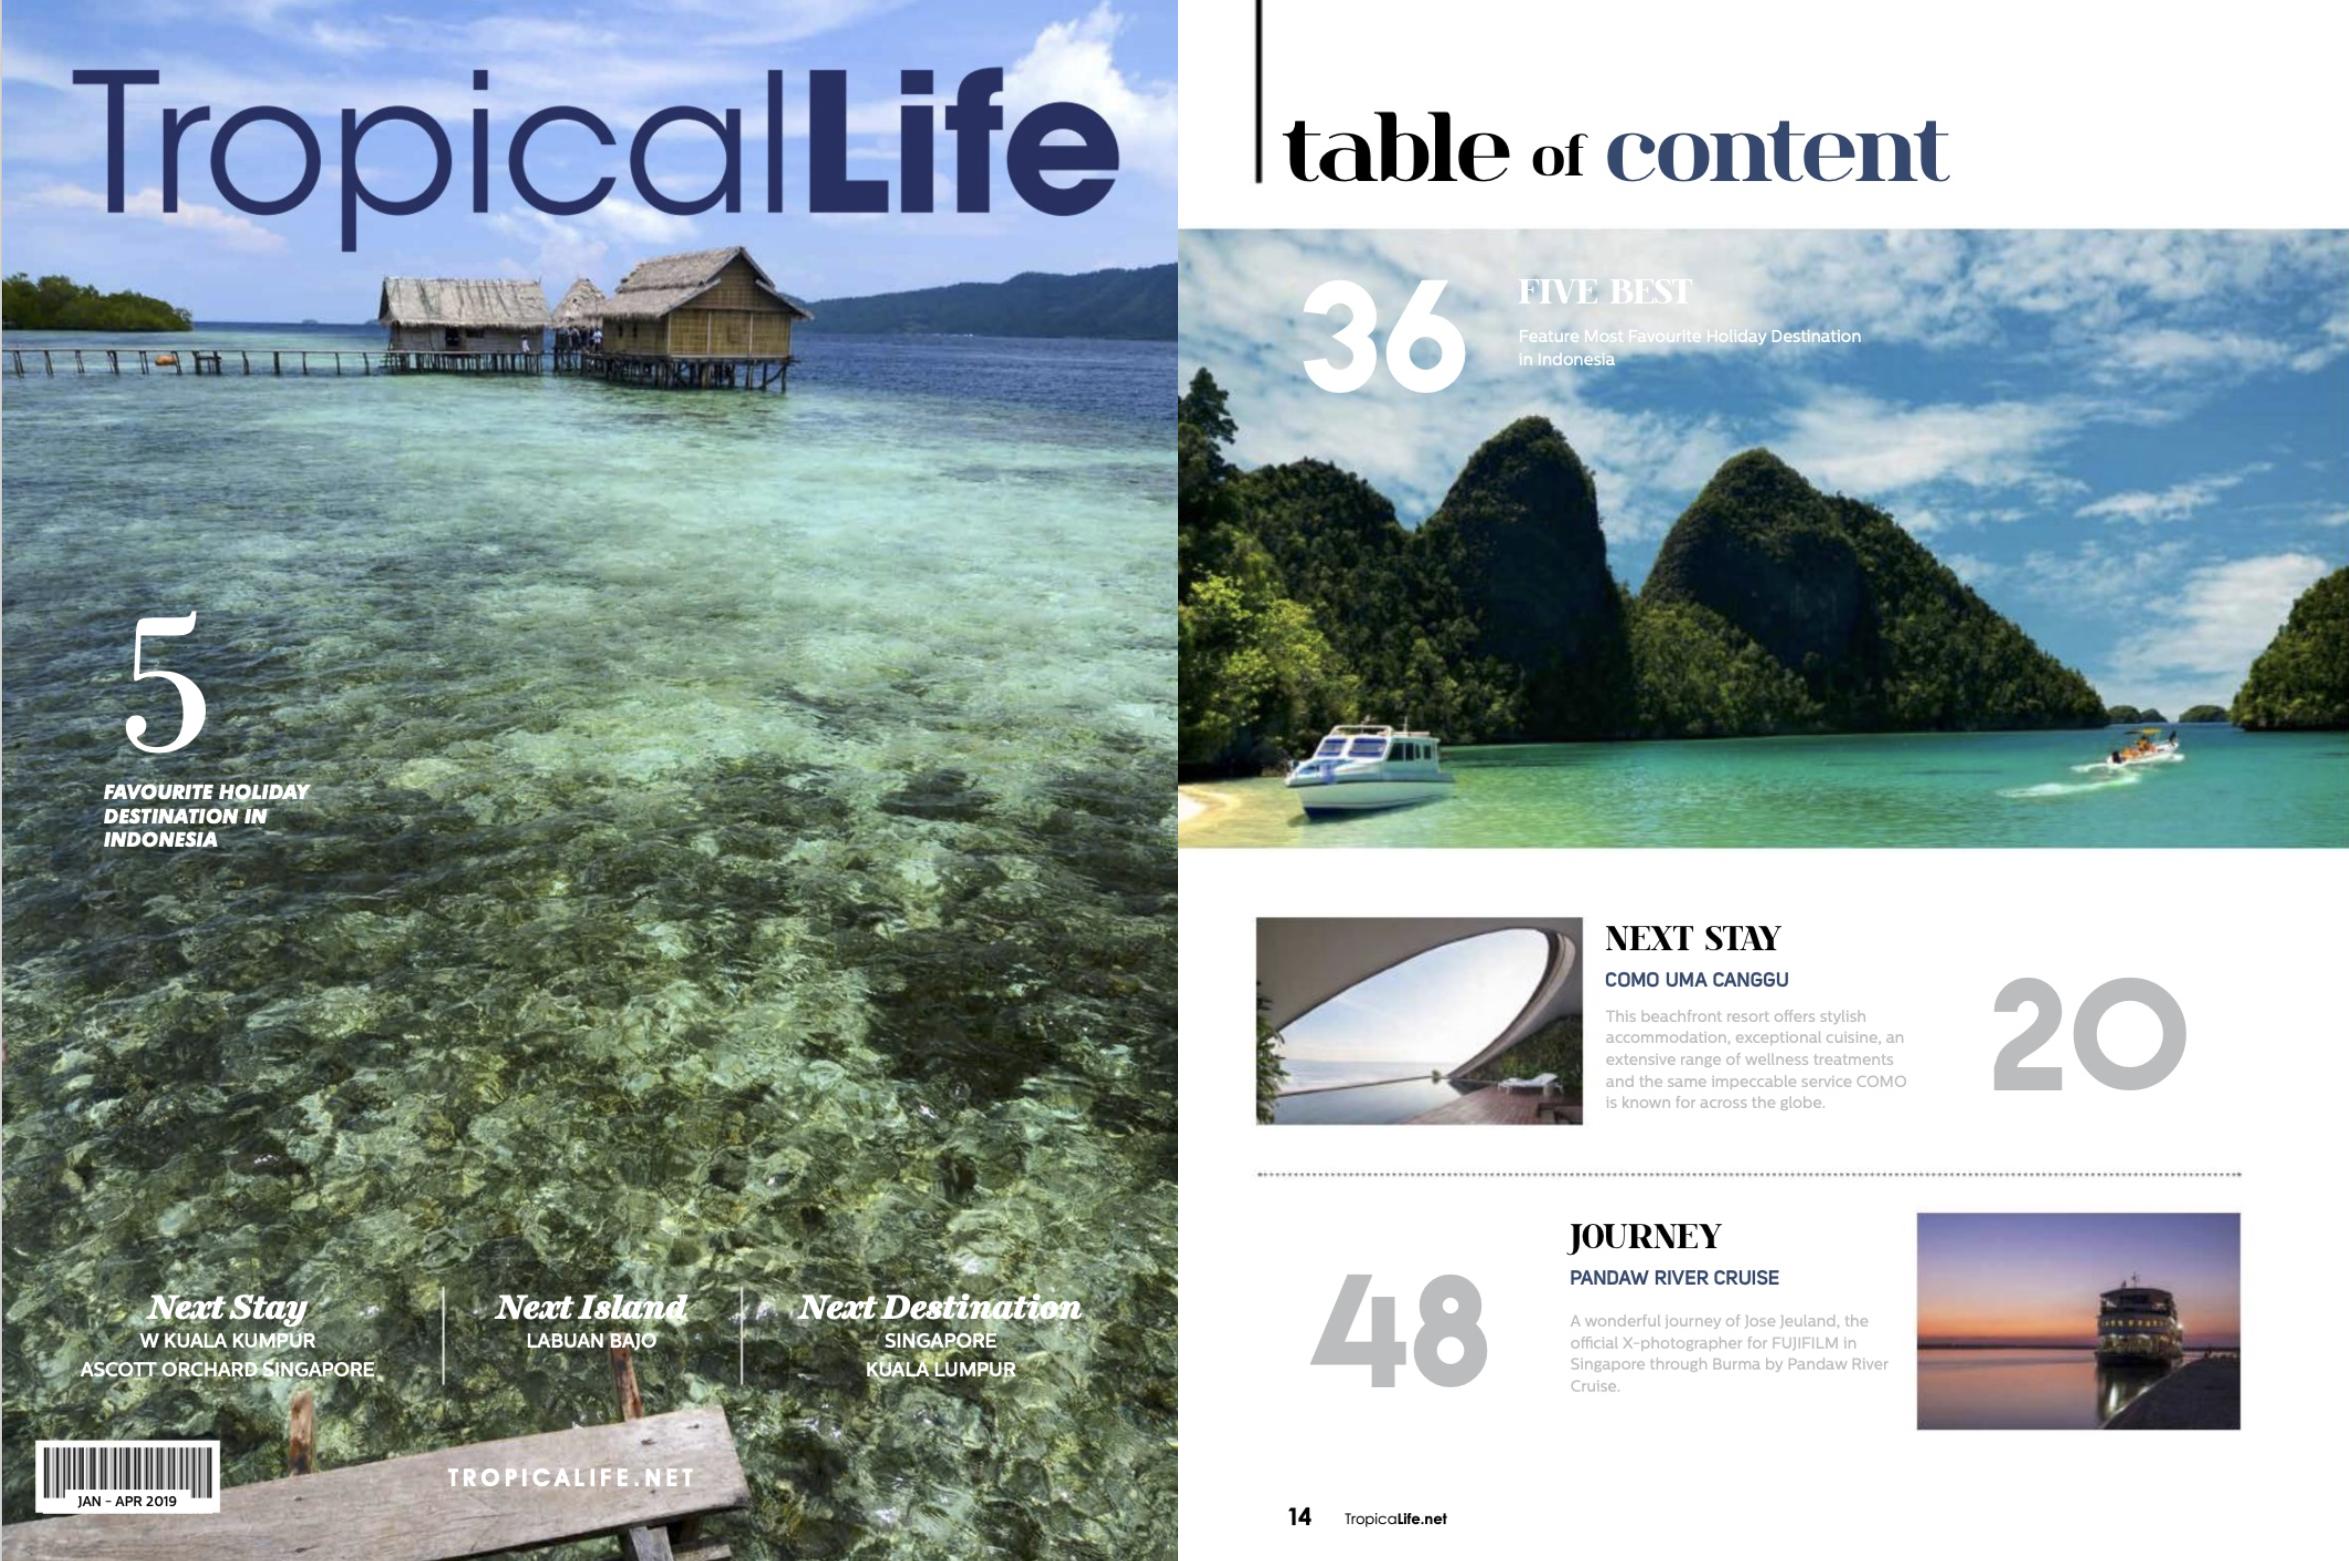 Tropicallife magazine Jan/Apr 2019 Pandaw boat cruise Myanmar Jose Jeuland photographer travel